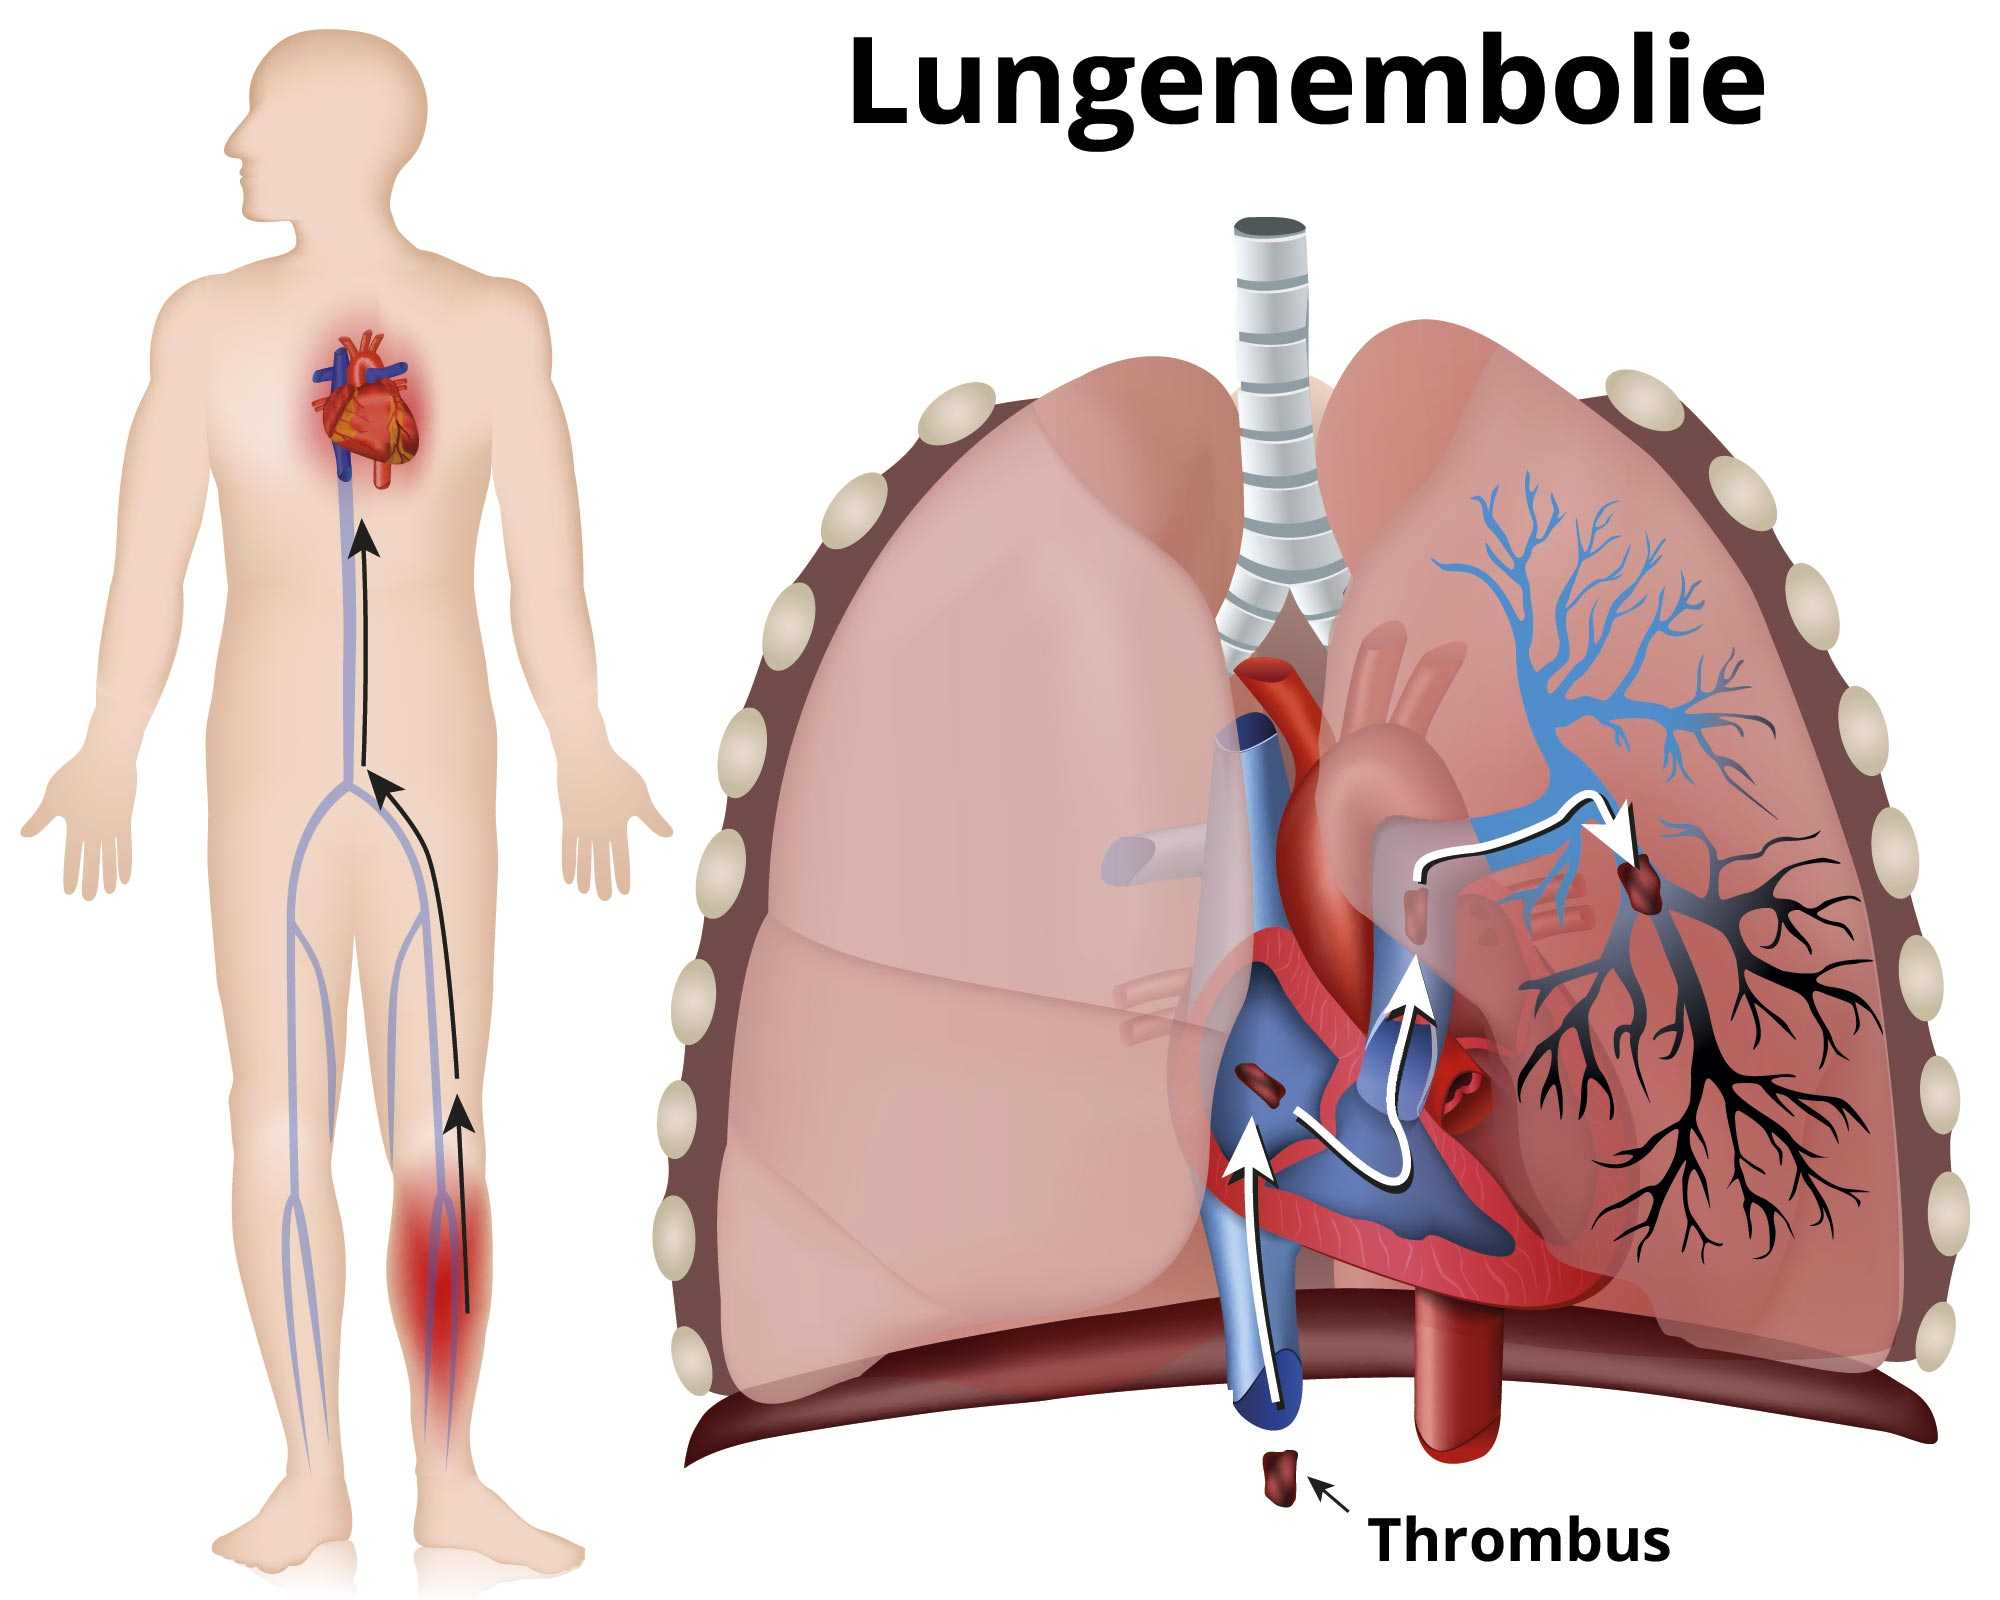 Thrombose angst vor erneuter Experten: Angst